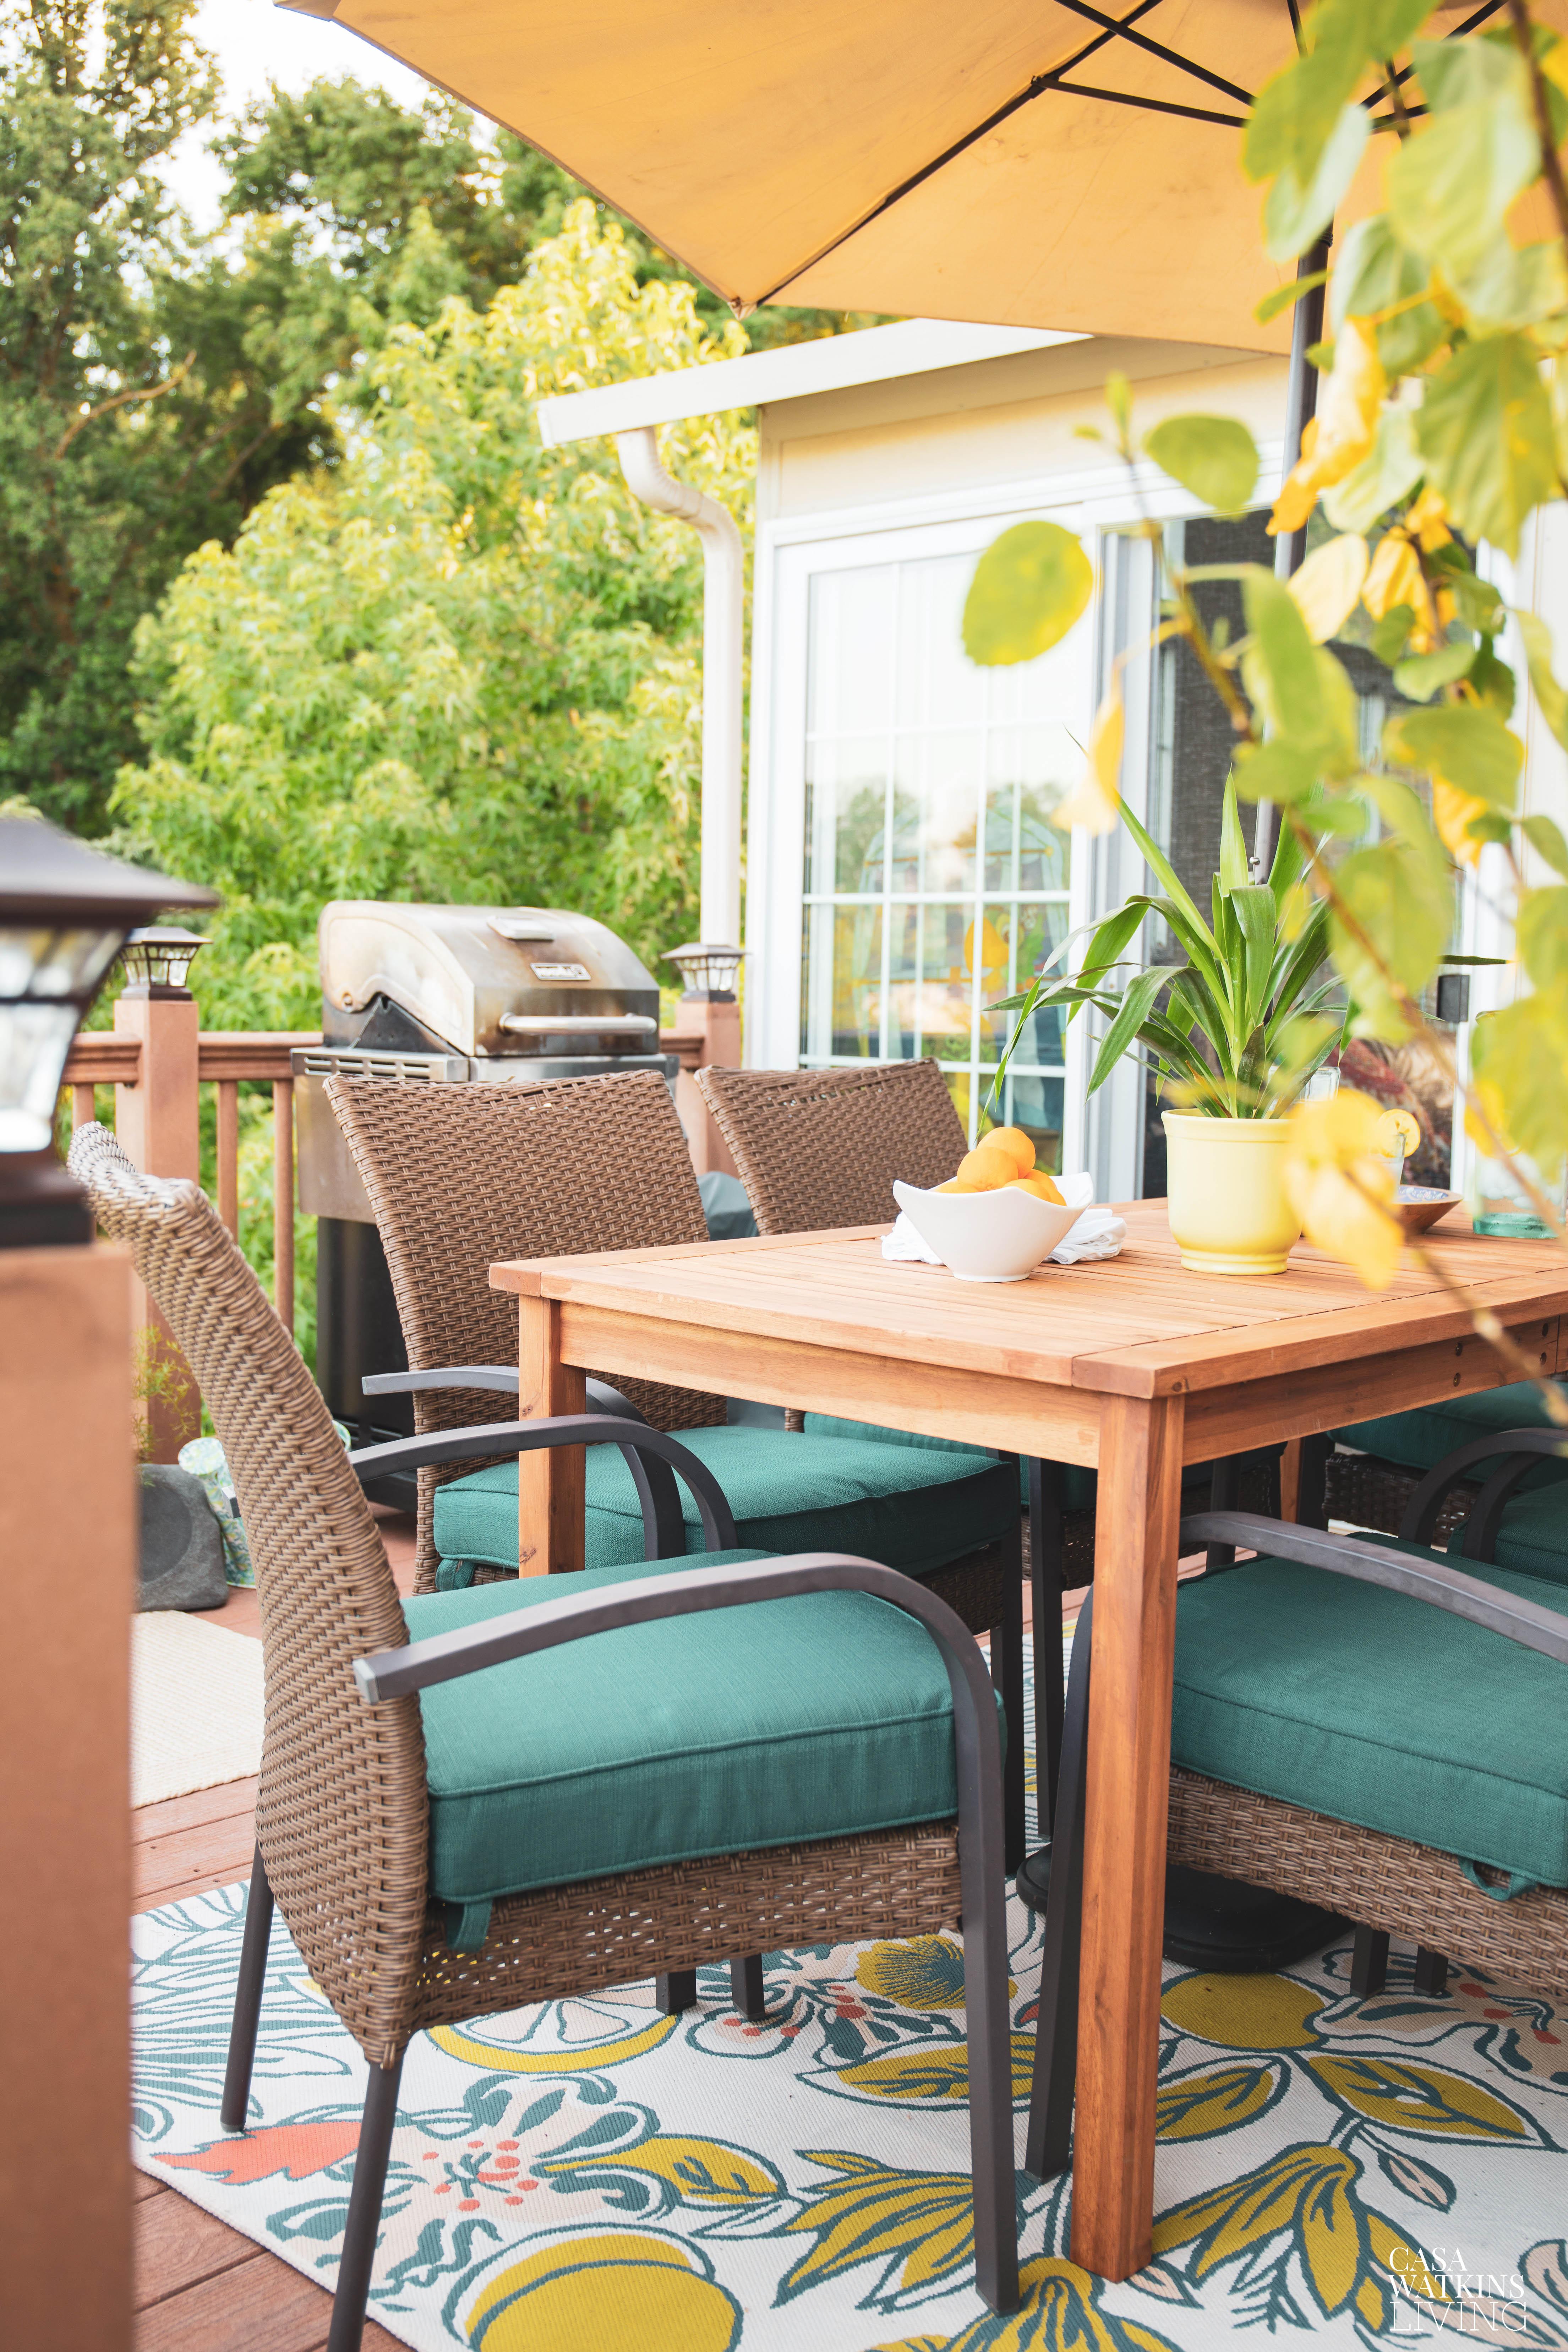 Bohemian Outdoor Decorating Ideas For Small Decks Casa Watkins Living